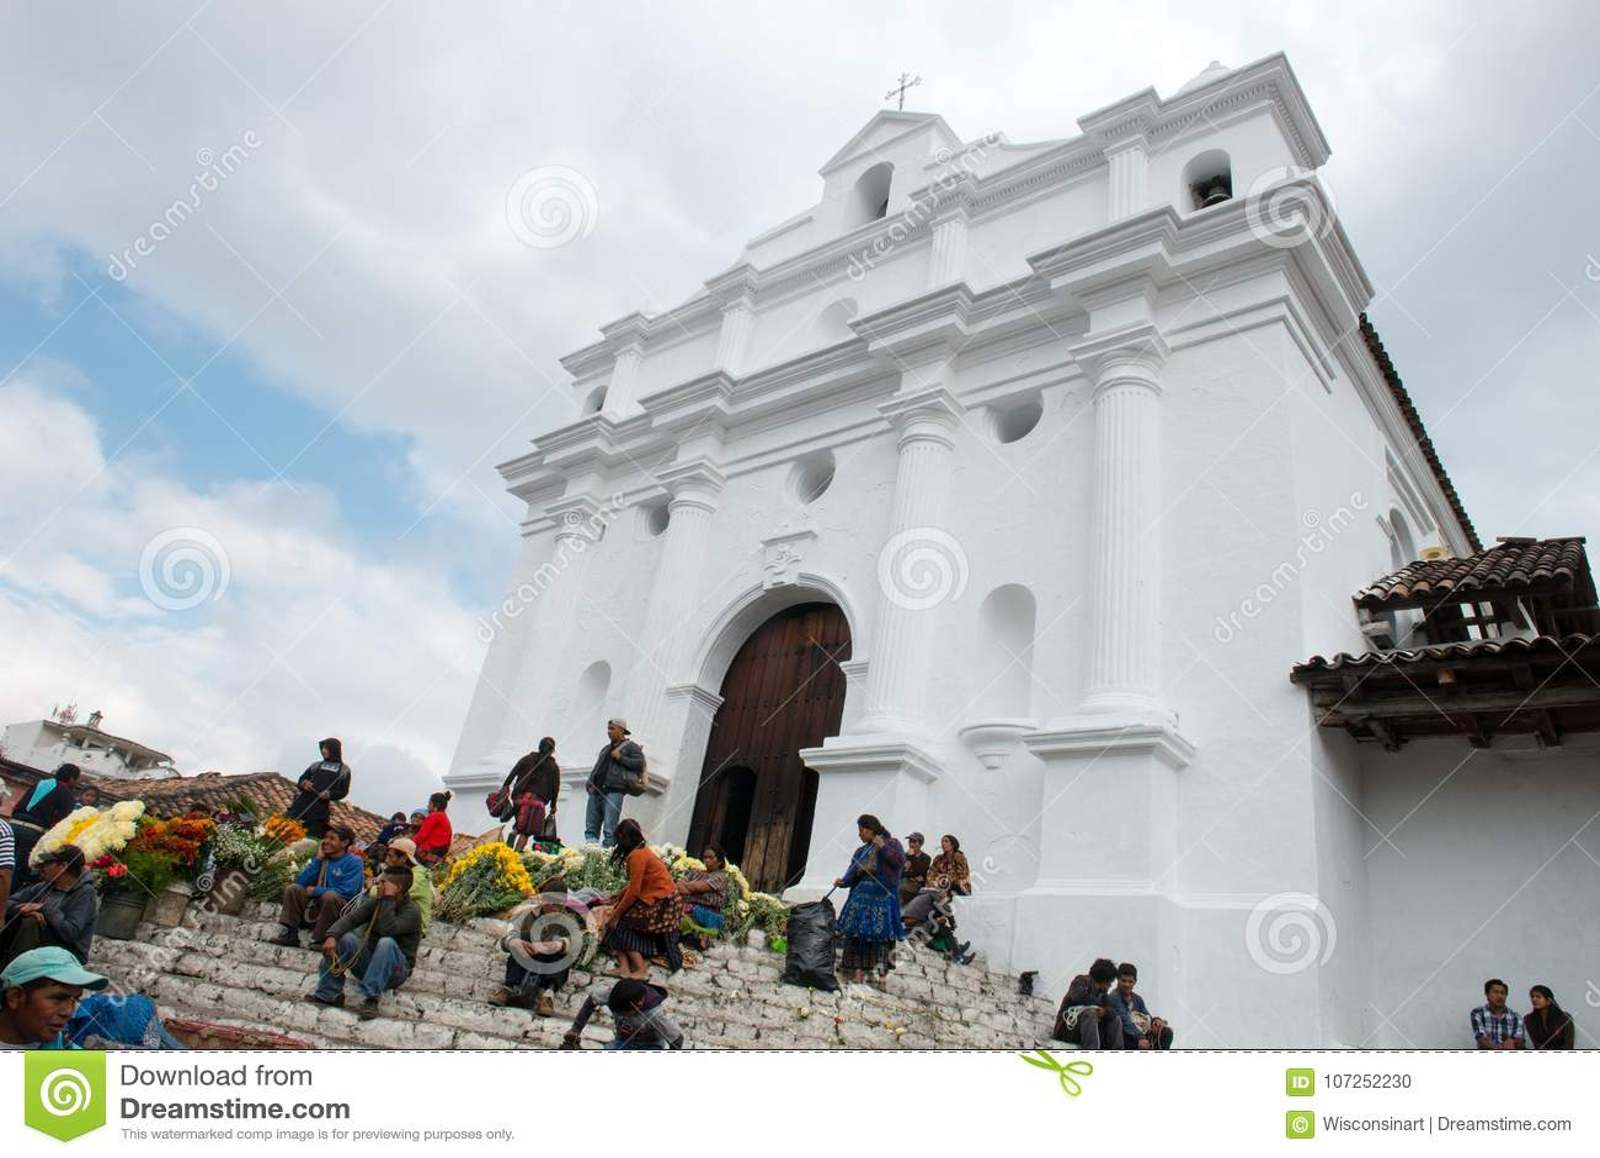 Santo Tomas Church, Guatemala Travel, Chichicastenengo